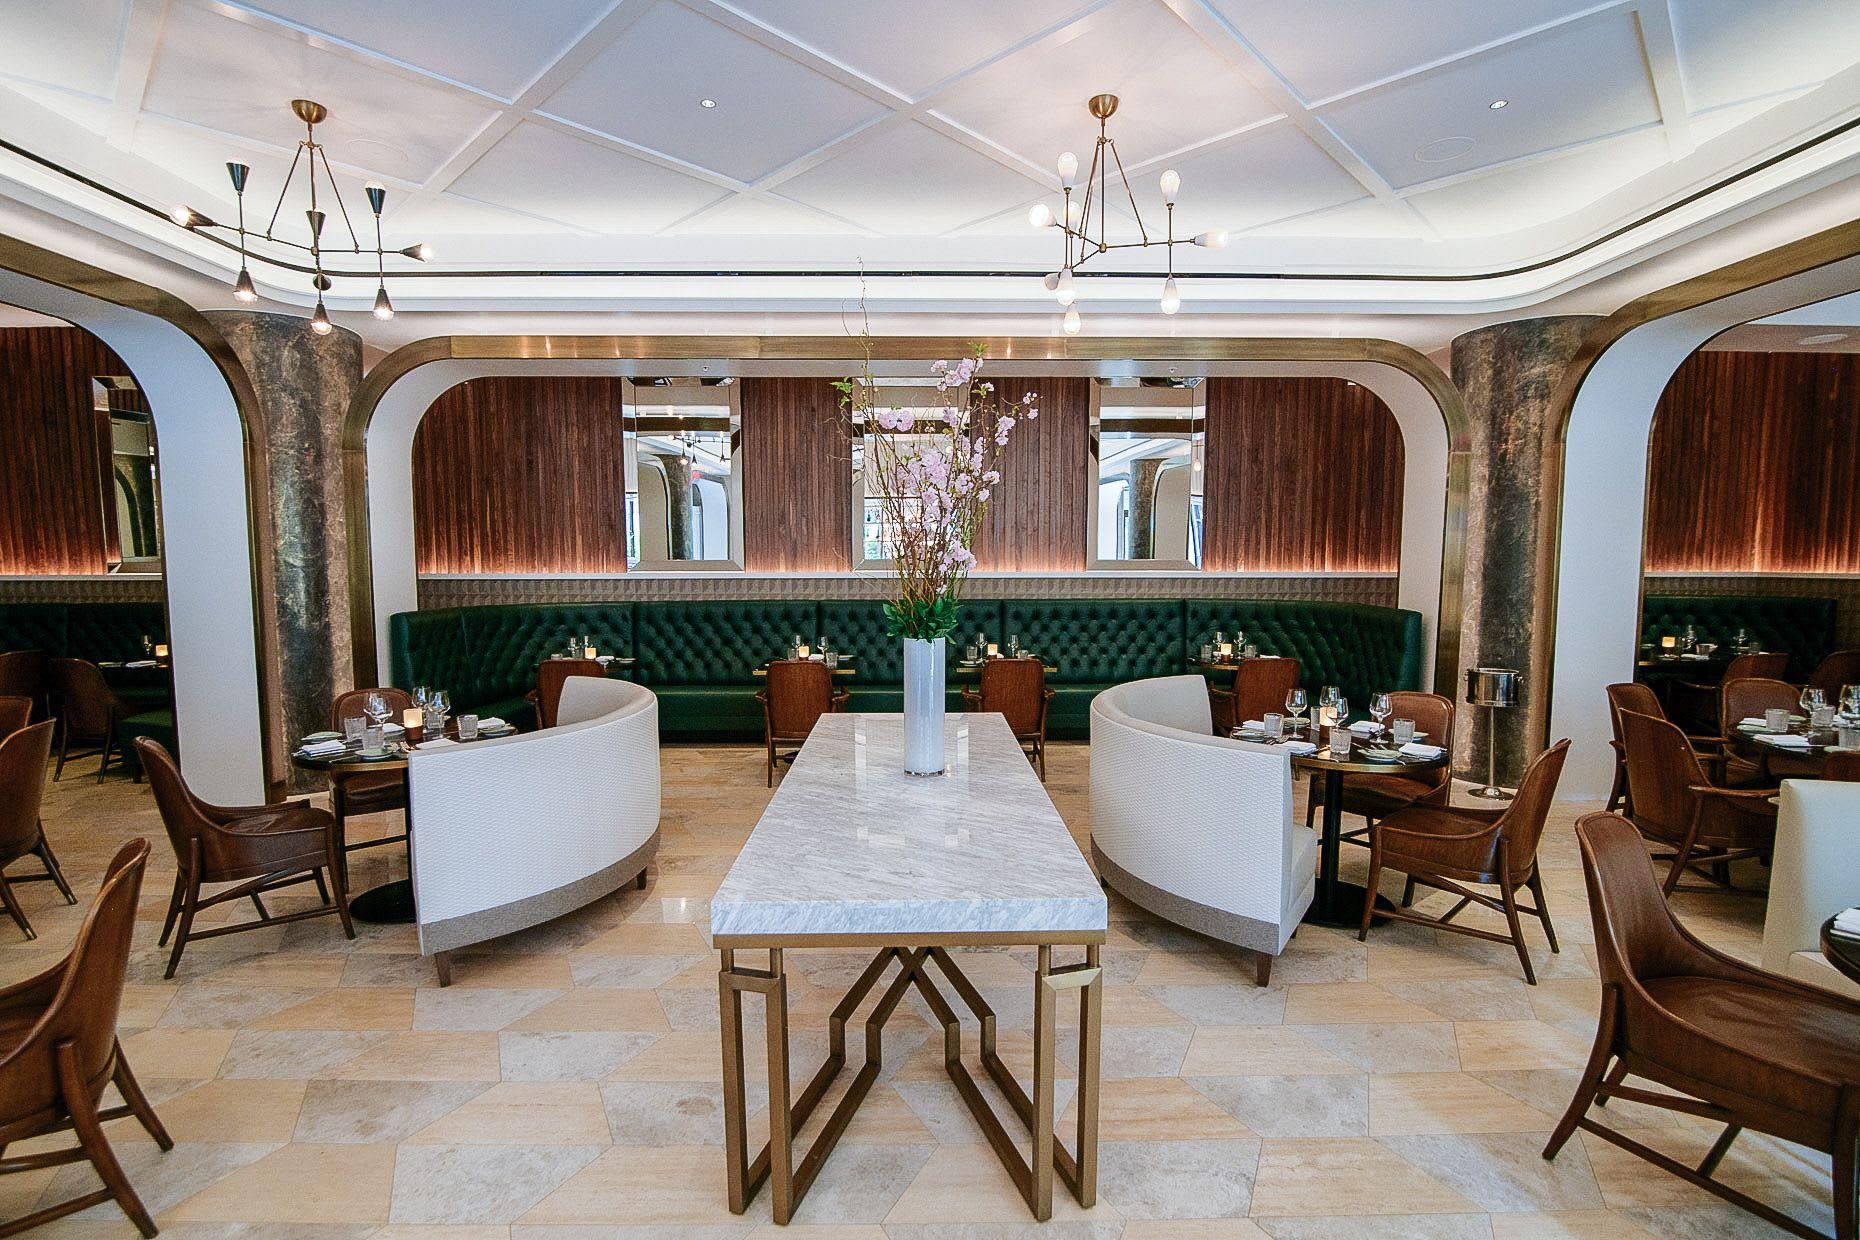 Tiles by Audrey Lane seen at The Ritz-Carlton Coconut Grove, Miami, Miami - Trapezoid (A)